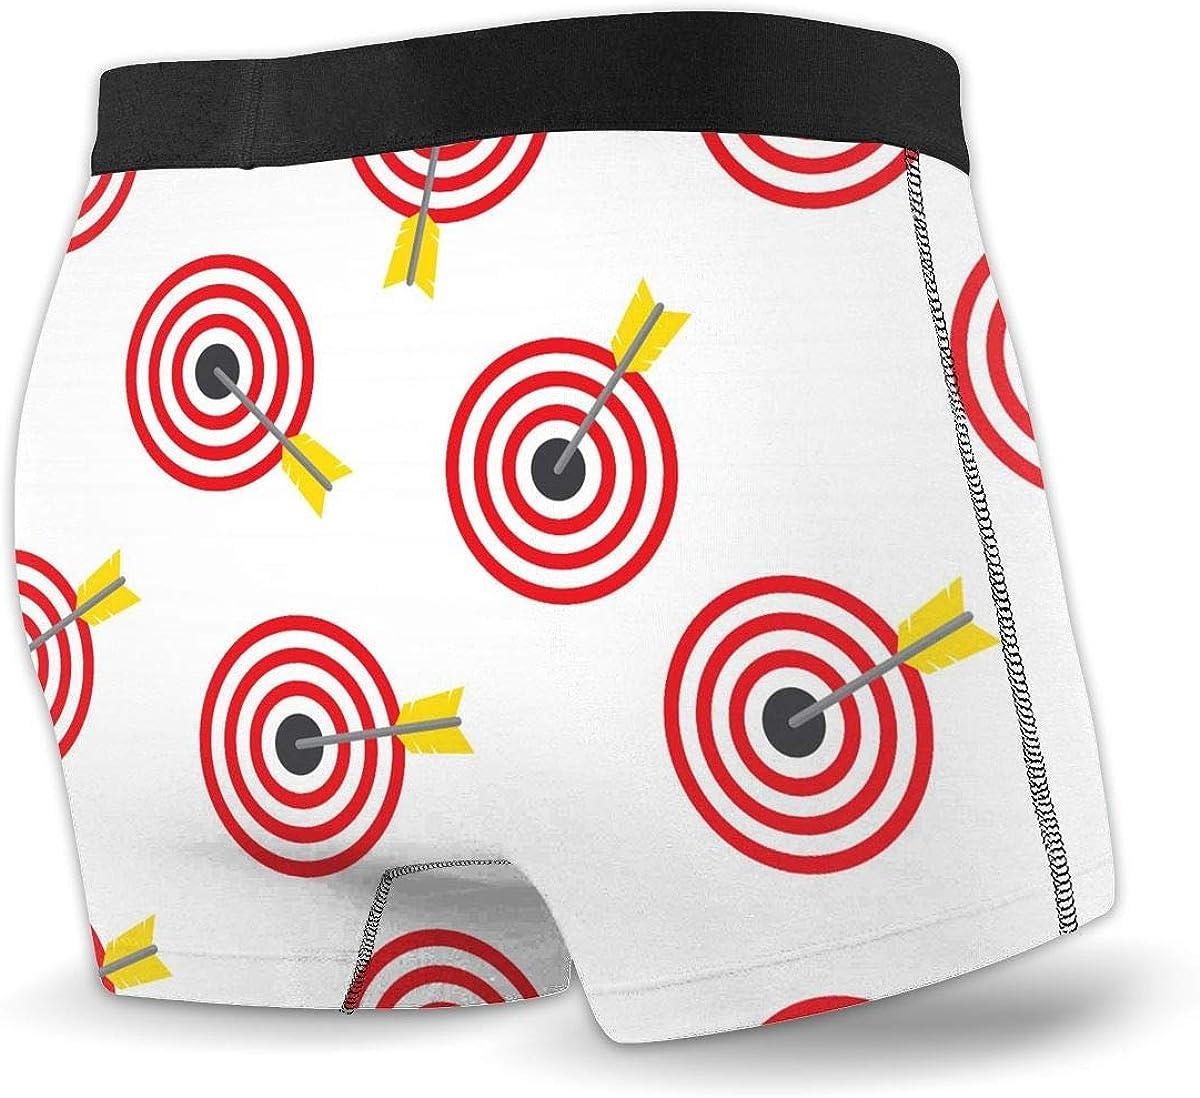 Dream Town J Archery Target Mens Boxer Briefs Underwear Lightweight Performance Underpants Trunks